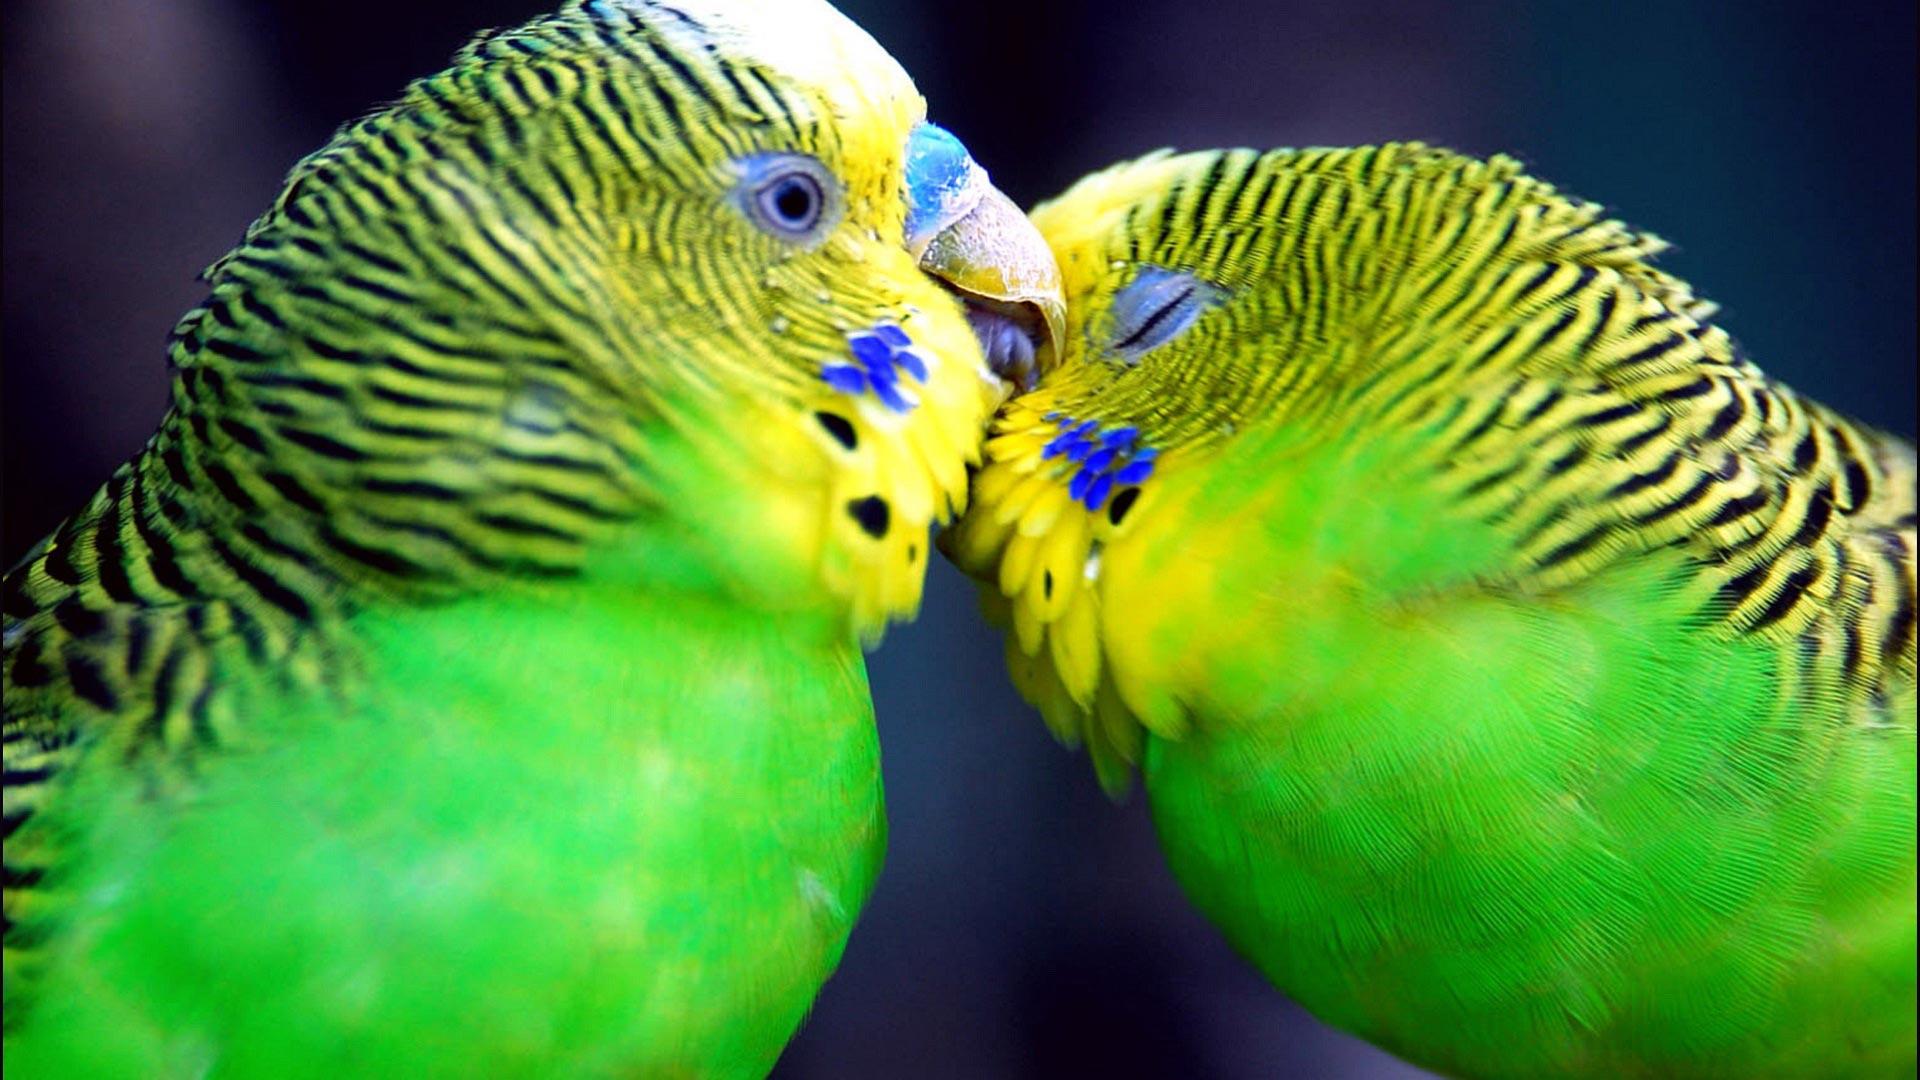 Amazon_parrots_widescreen_wallpaper